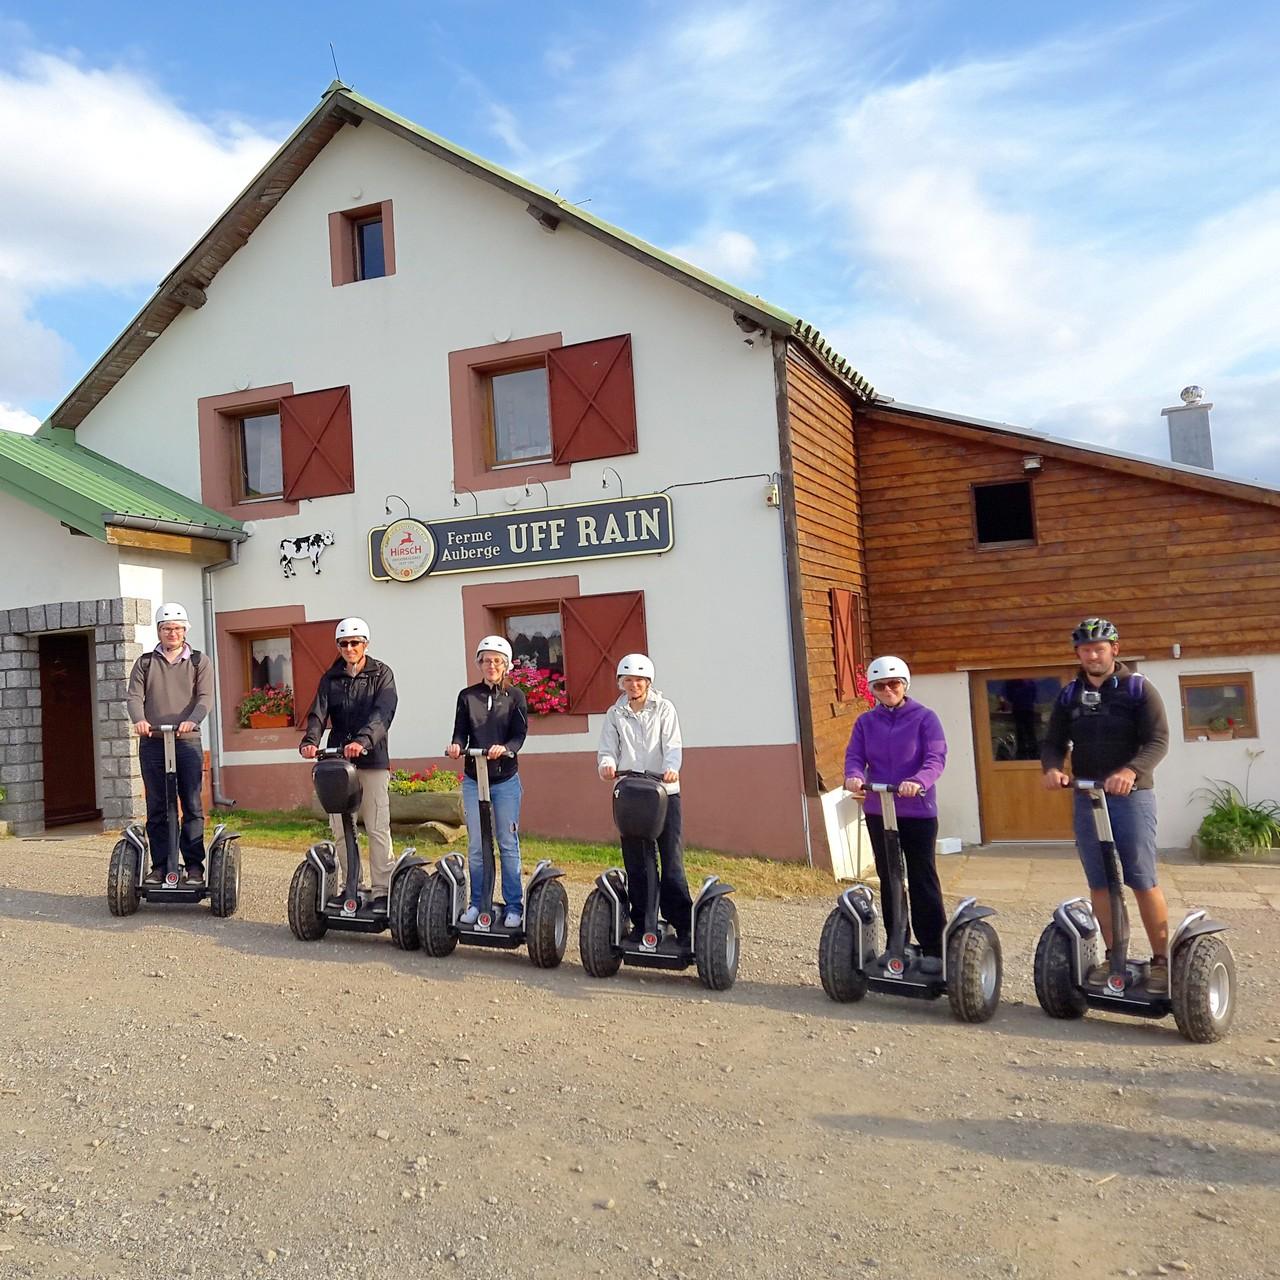 FUN MOVING GYROPODE SEGWAY EN ALSACE - ferme auberge Uff Rain, Vosges